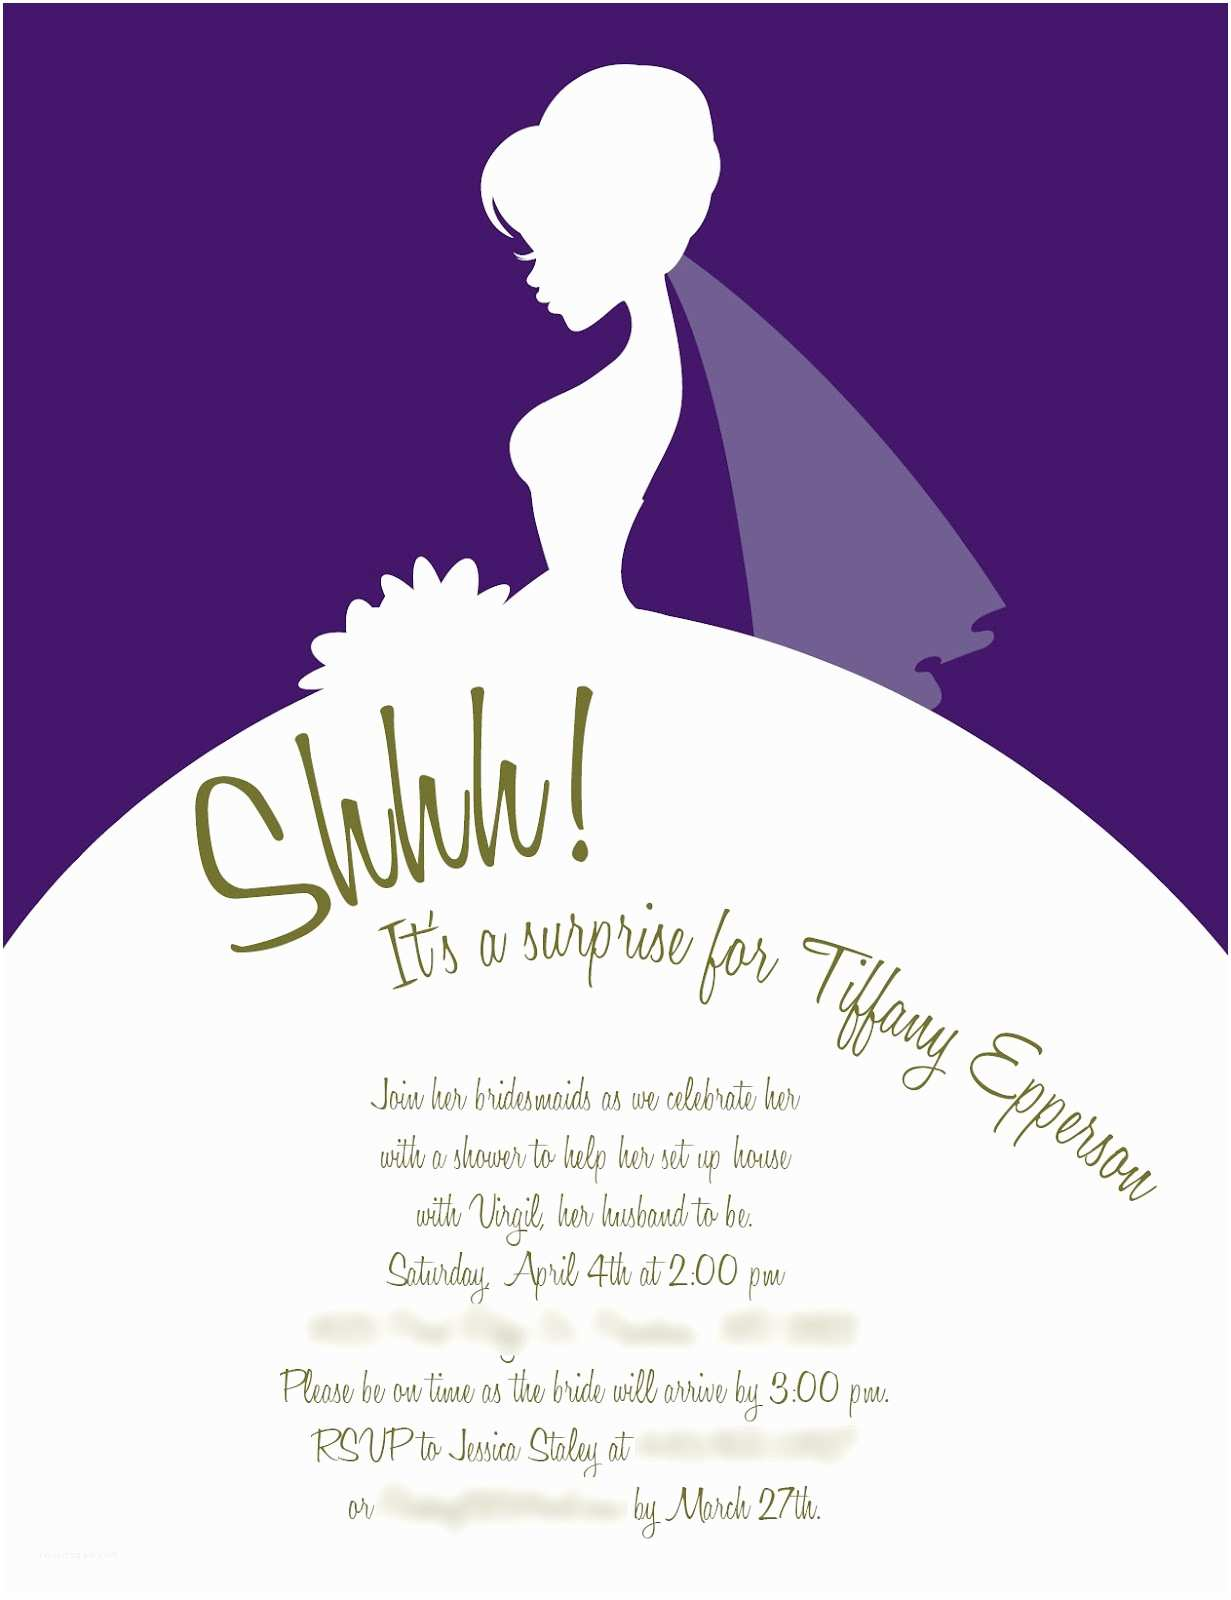 Bridal Shower Invitations Funny Wedding Invitations Wedding Plan Ideas